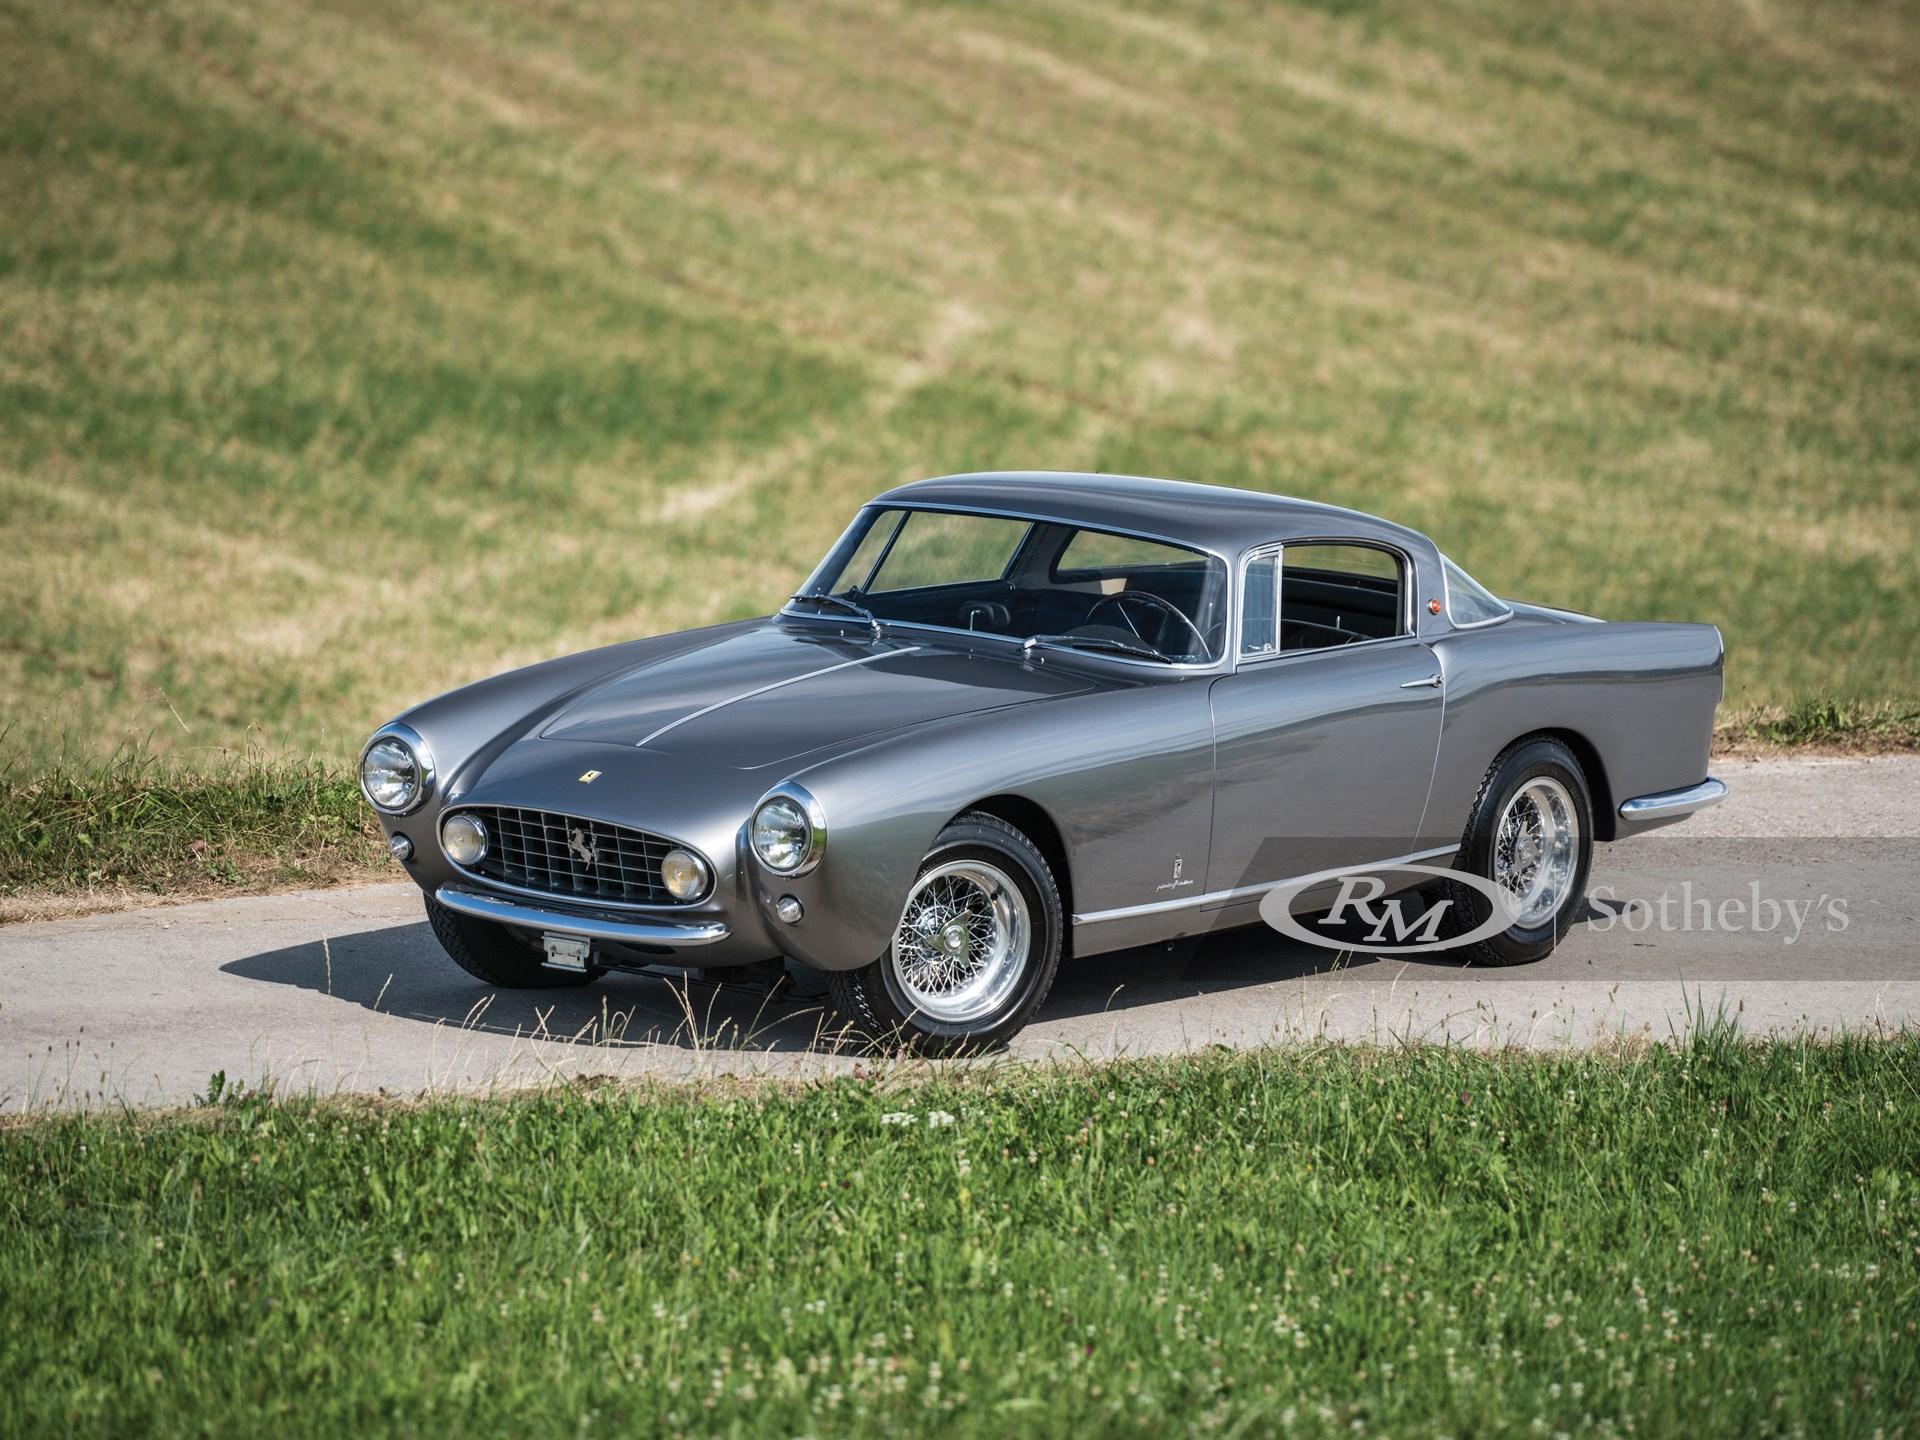 1956 Ferrari 250 GT Coupe 'Boano Prototype' by Pinin Farina